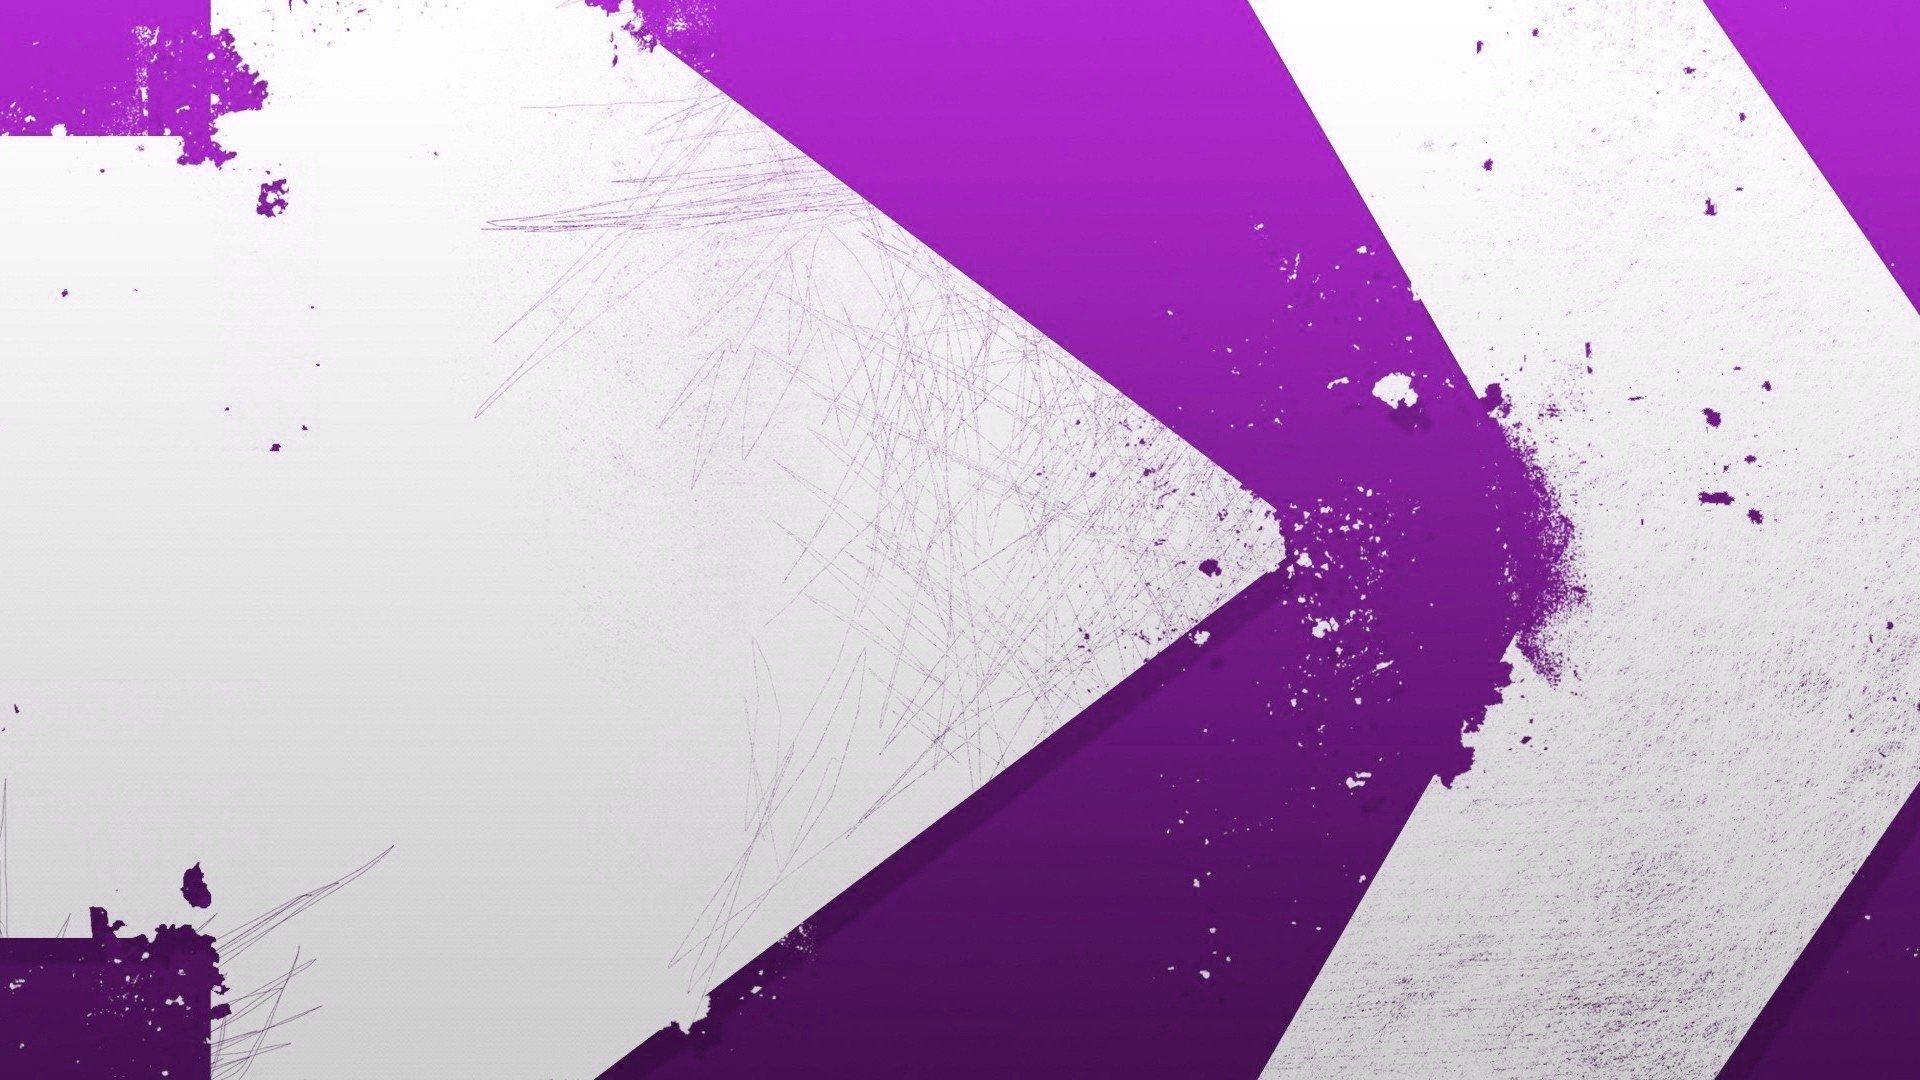 Abstract Design Purple Paint Arrows Wallpaper 1920x1080